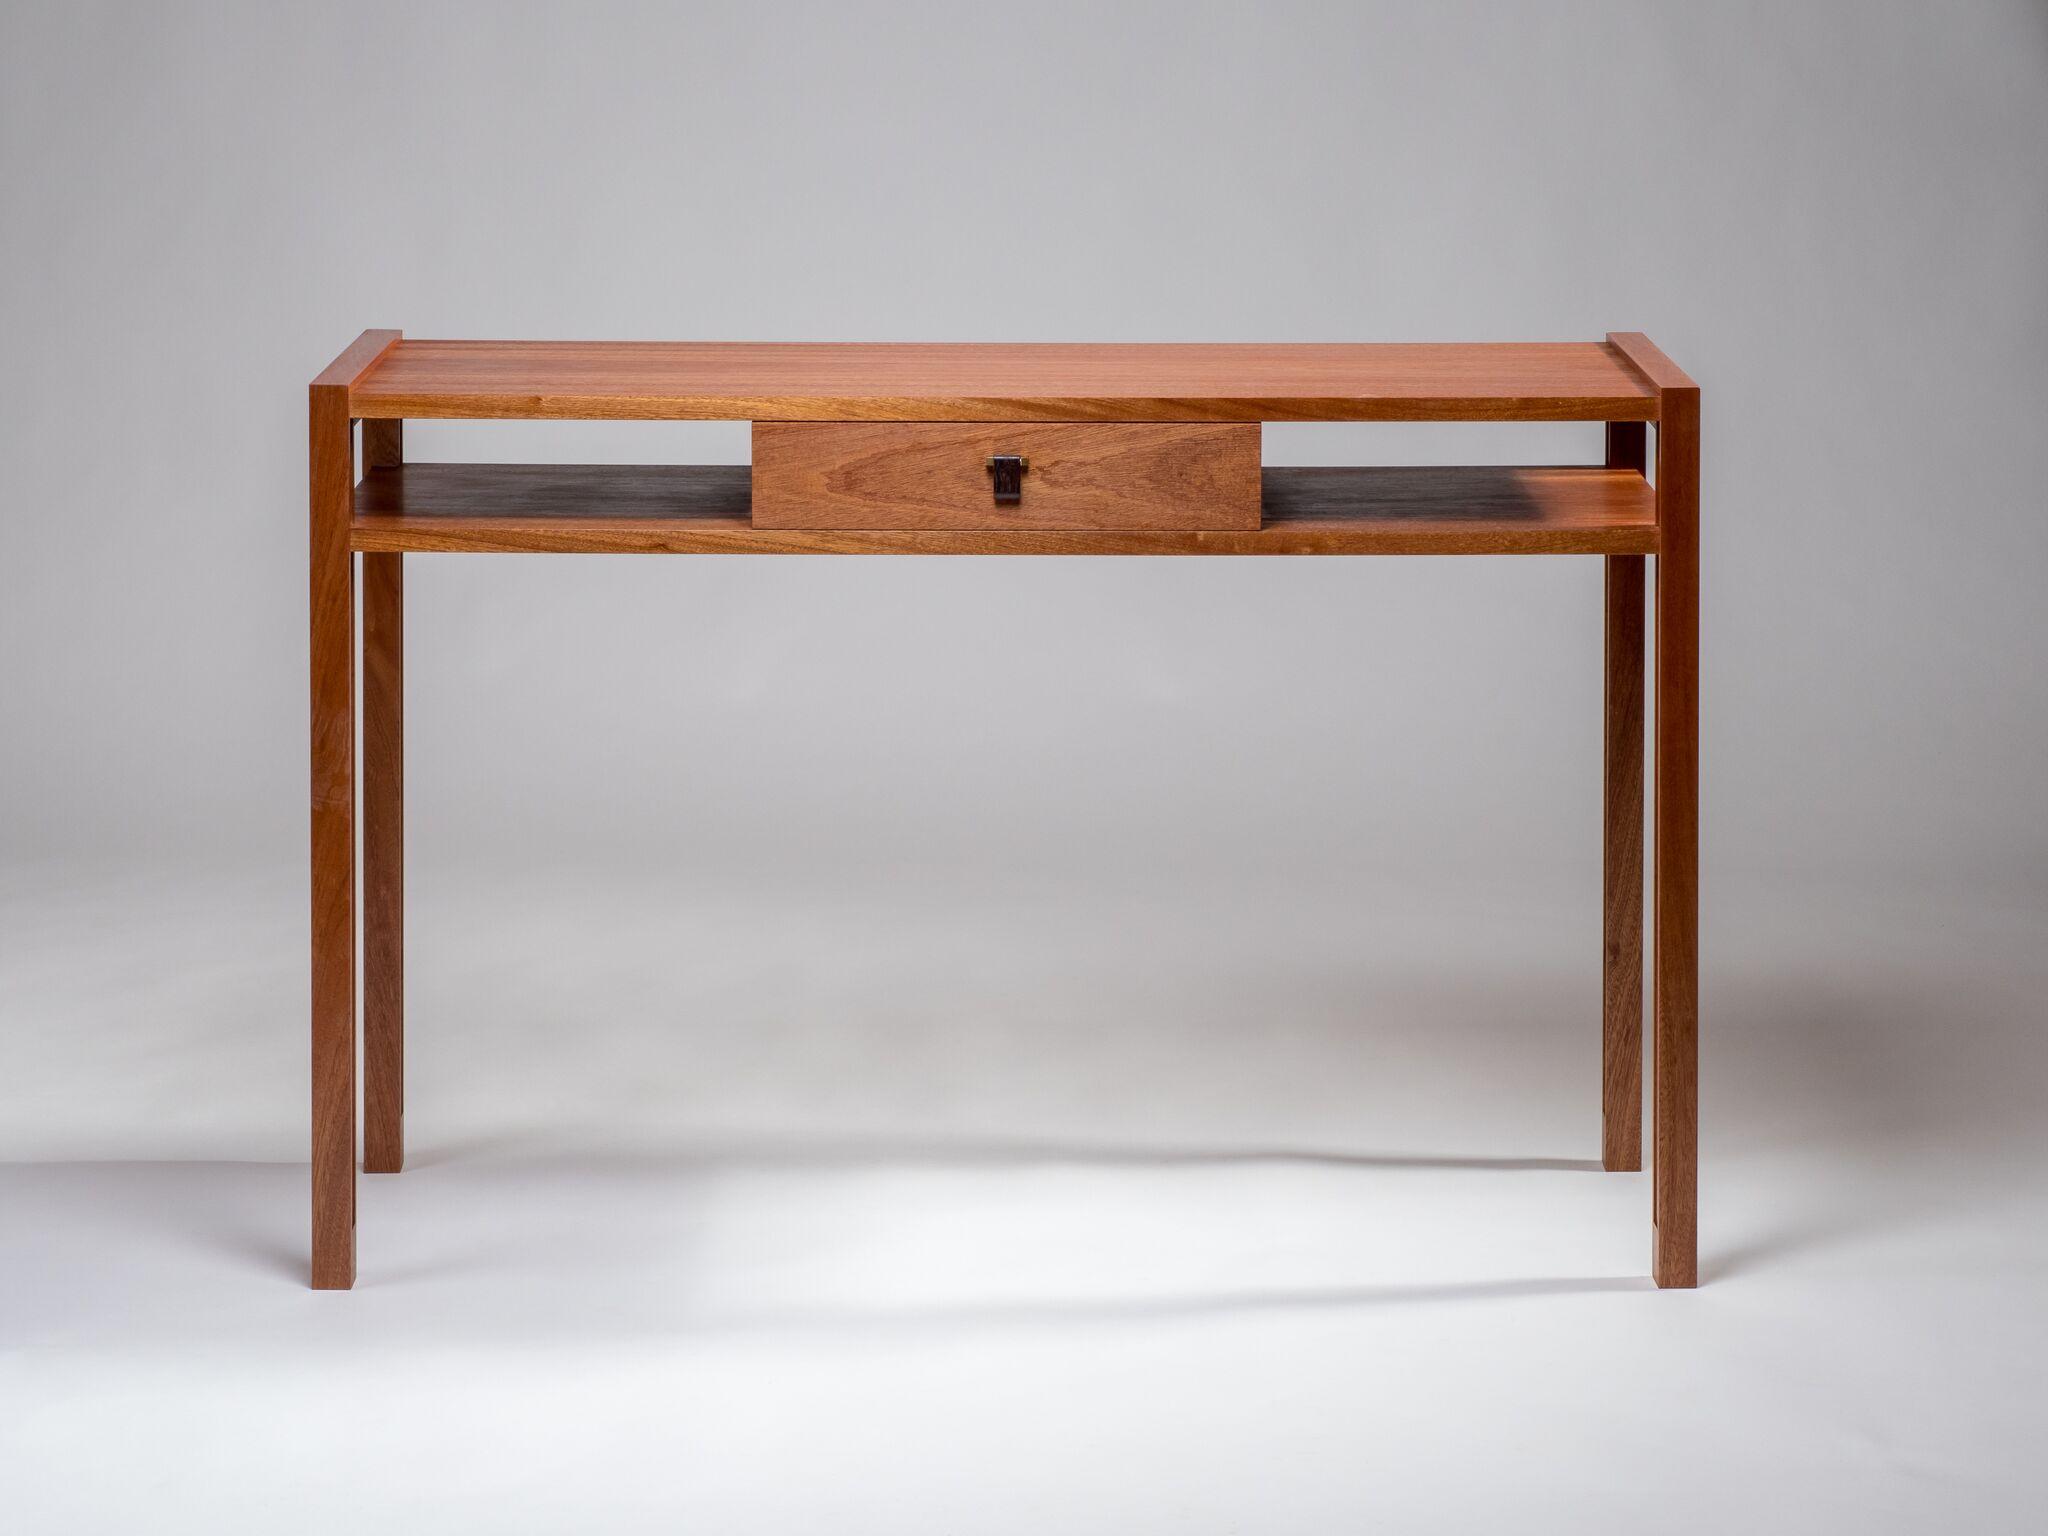 contemporary-hallway-table-desk-edward-wormley.jpeg